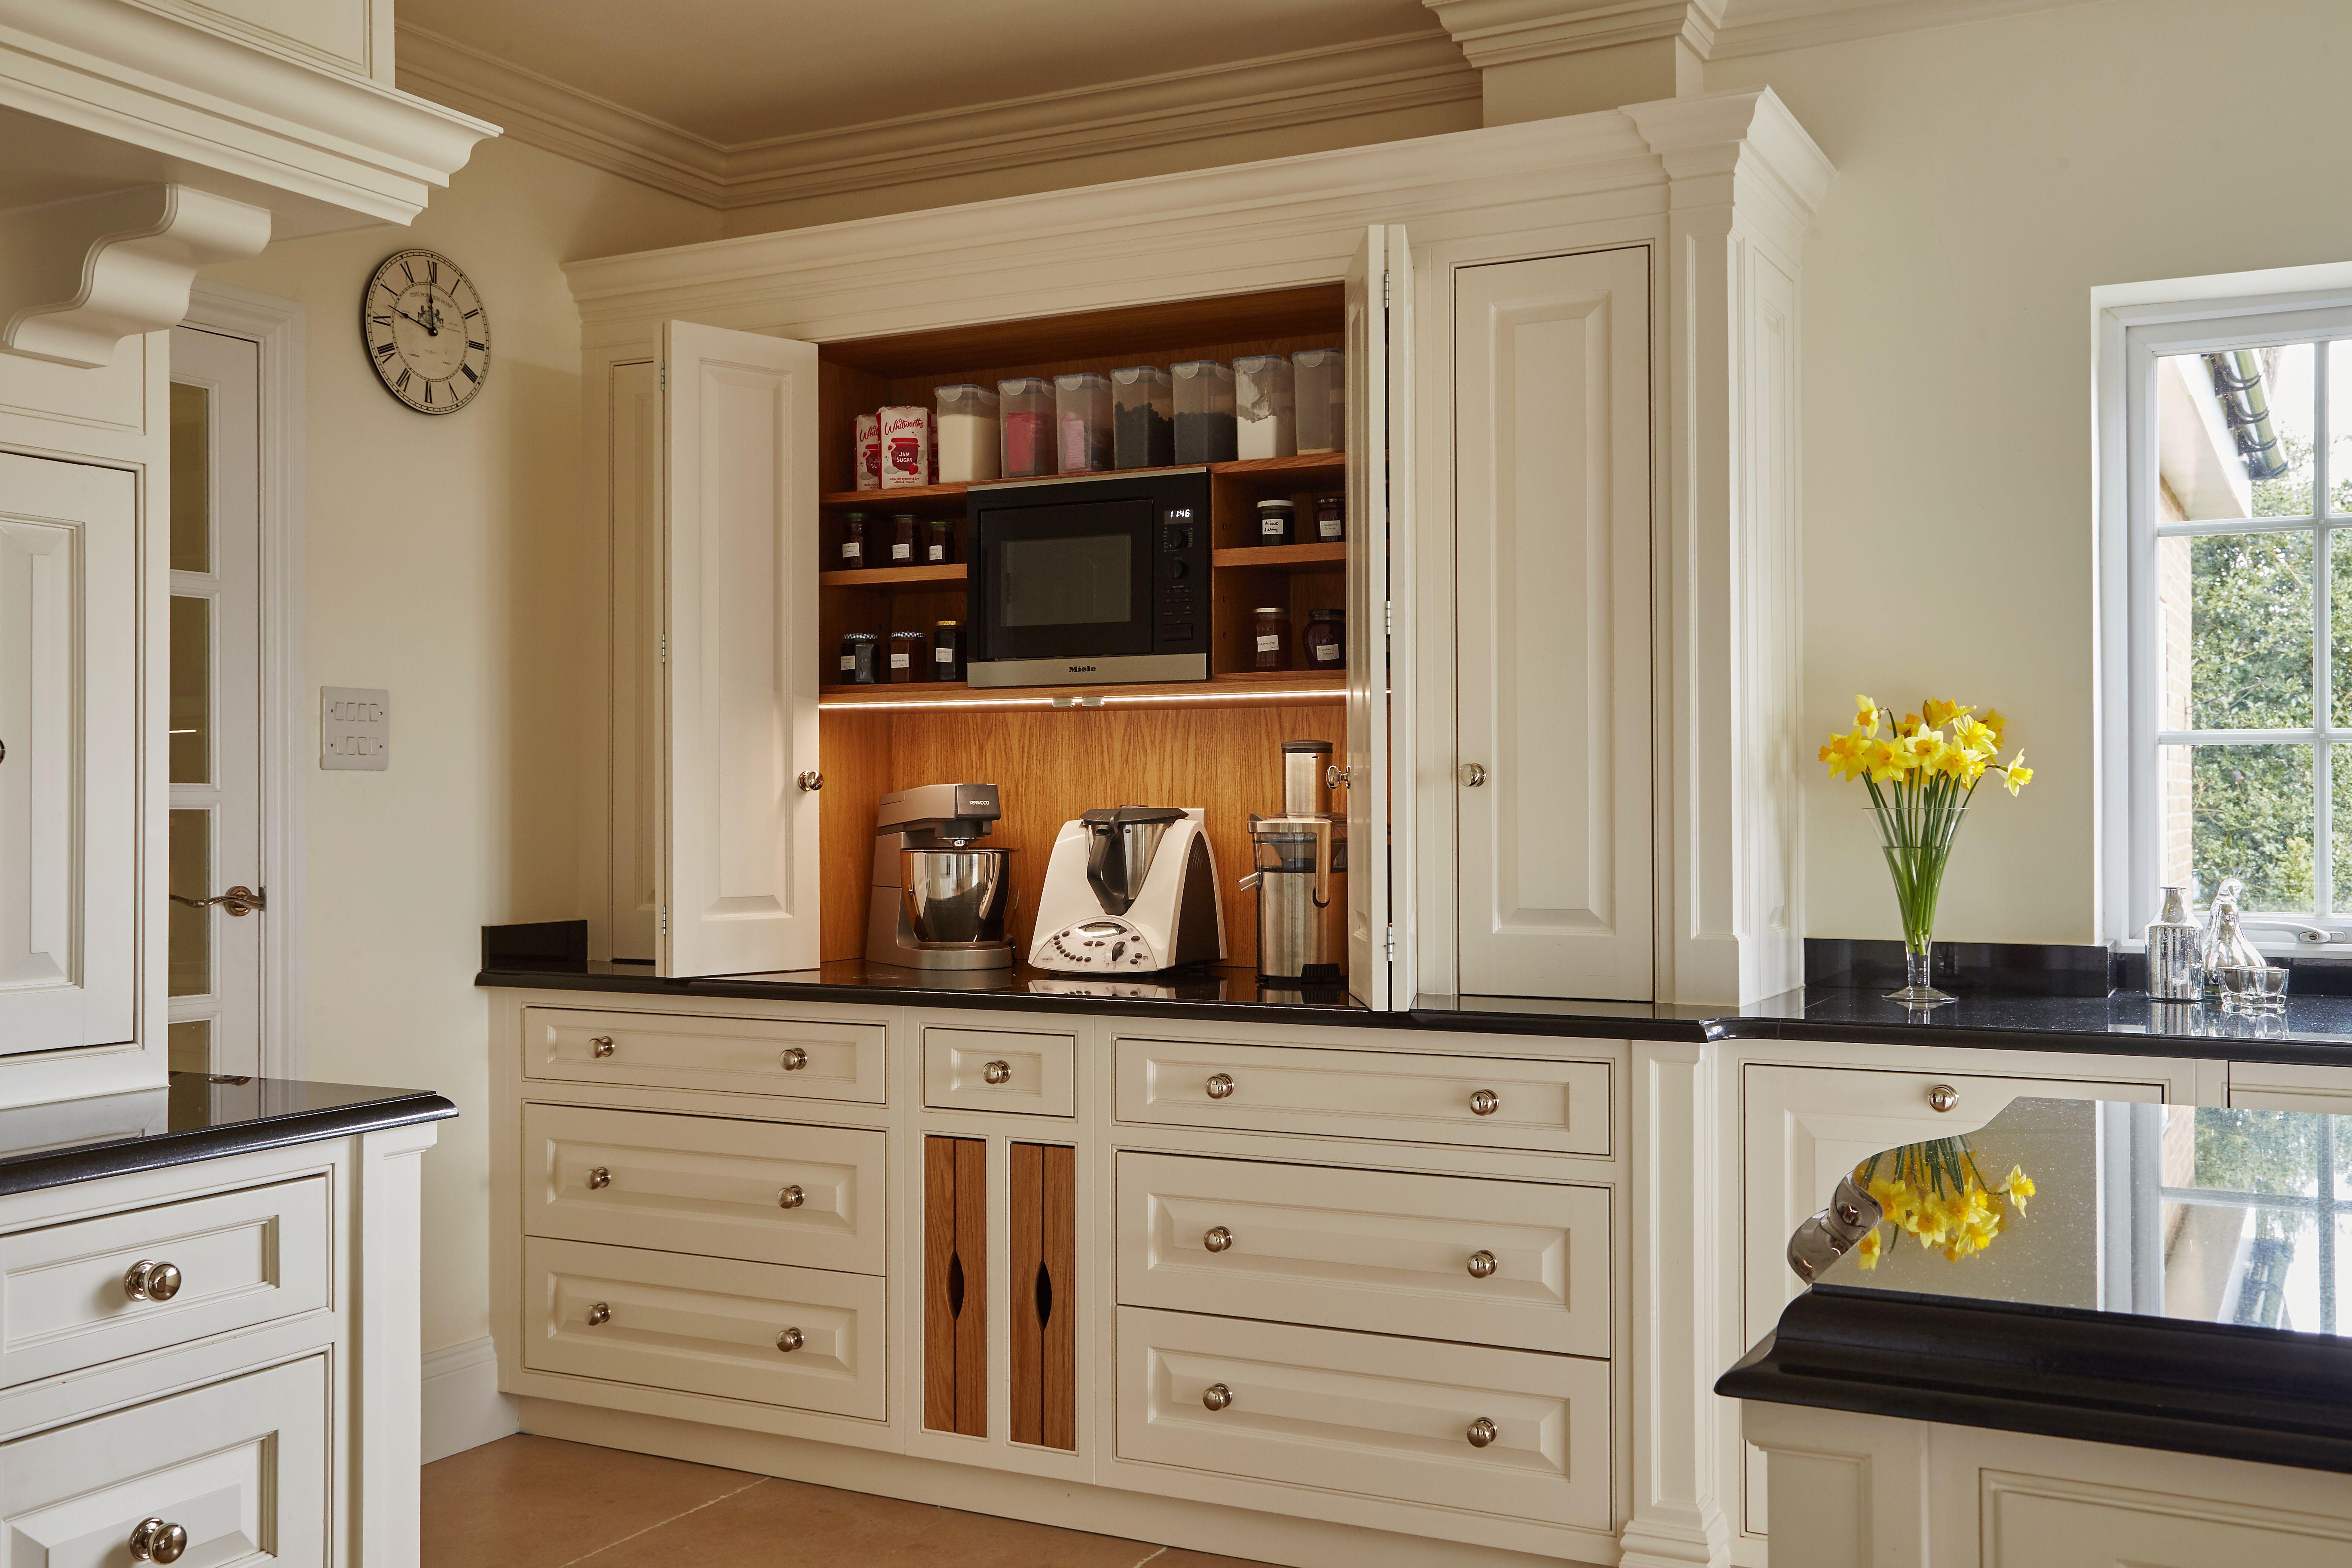 Luxury Bespoke hand made kitchen, hand painted kitchen ...